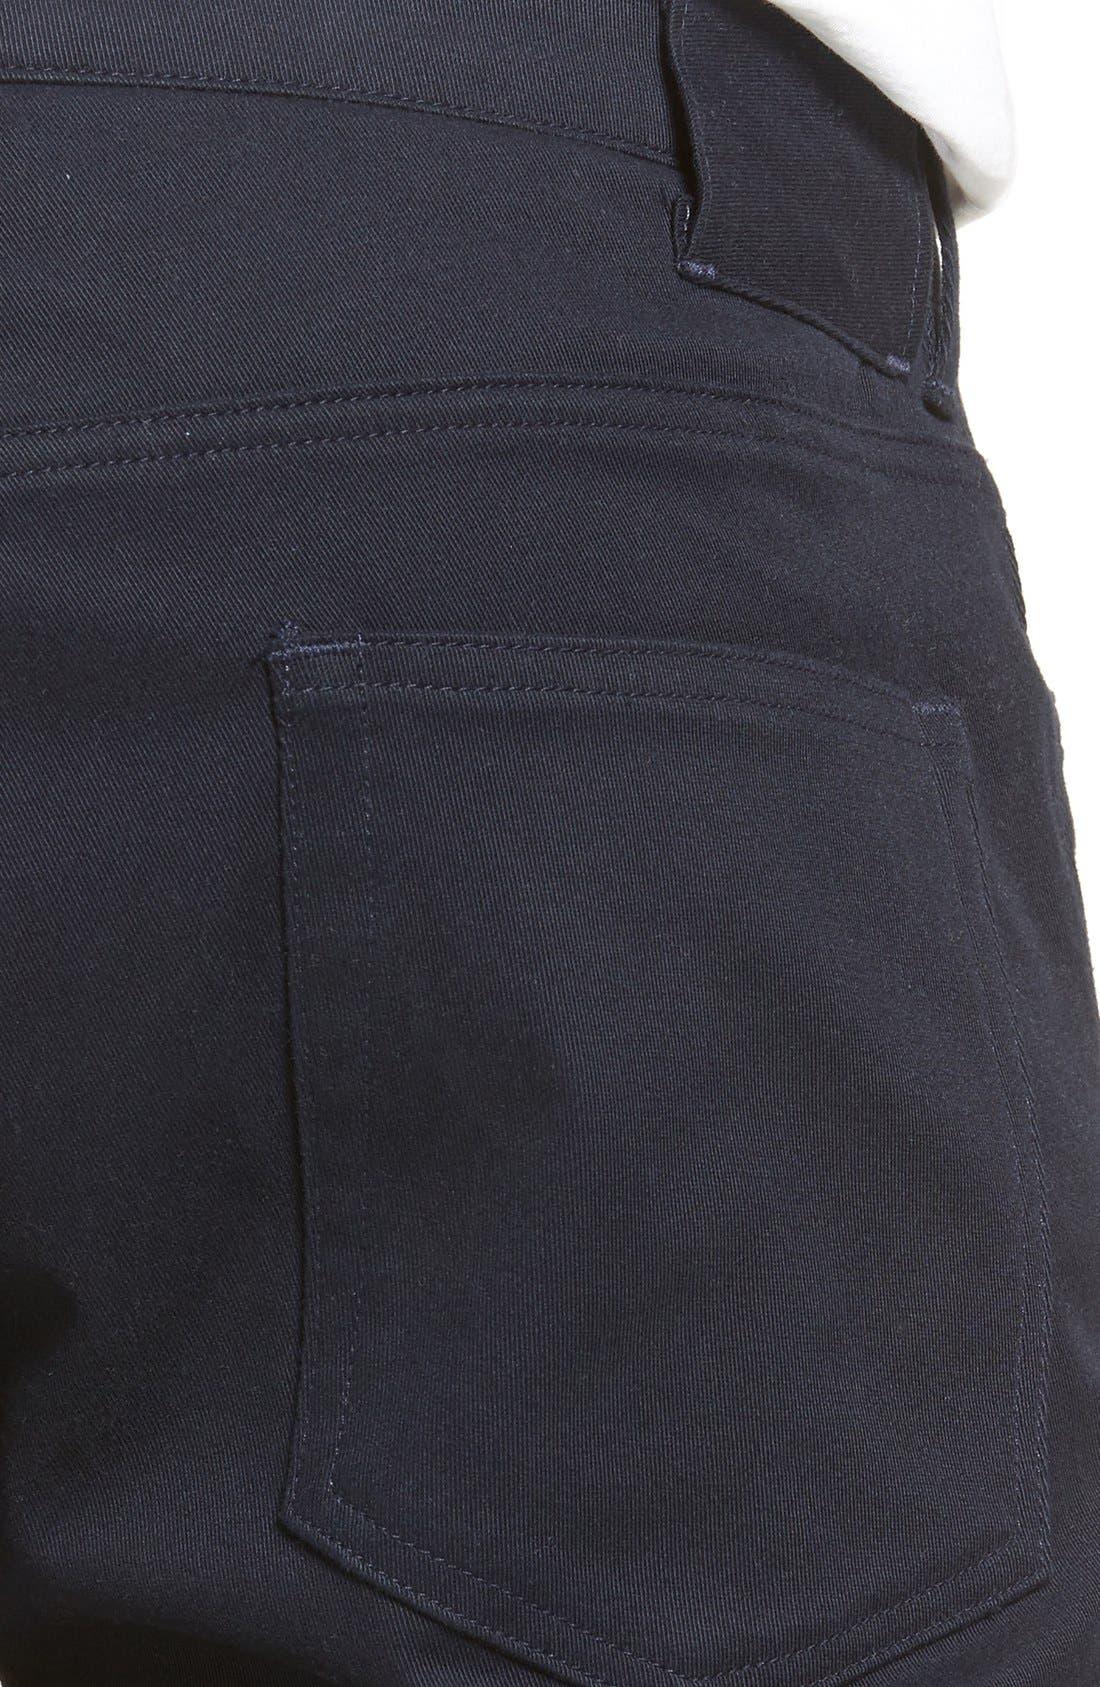 Soho Slim Fit Five-Pocket Pants,                             Alternate thumbnail 6, color,                             COASTAL